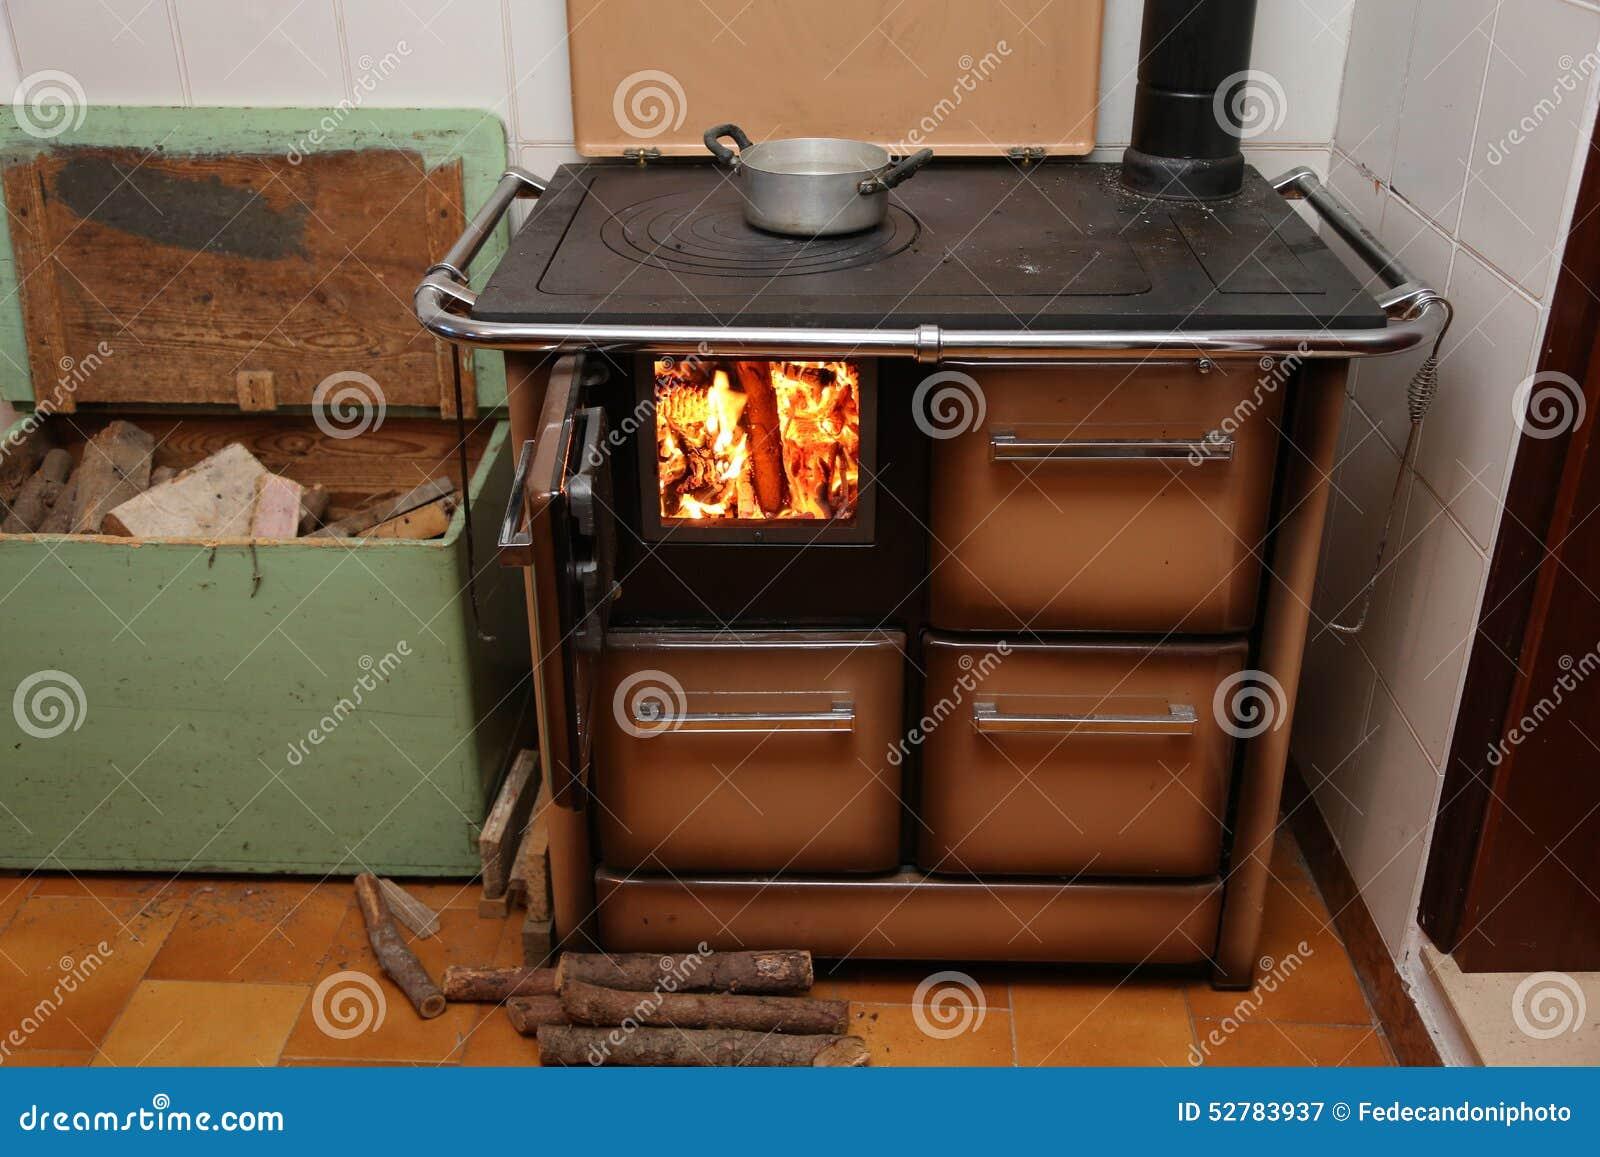 Best cucine a legna antiche pictures ideas design 2017 for Stufe a legna argo prezzi